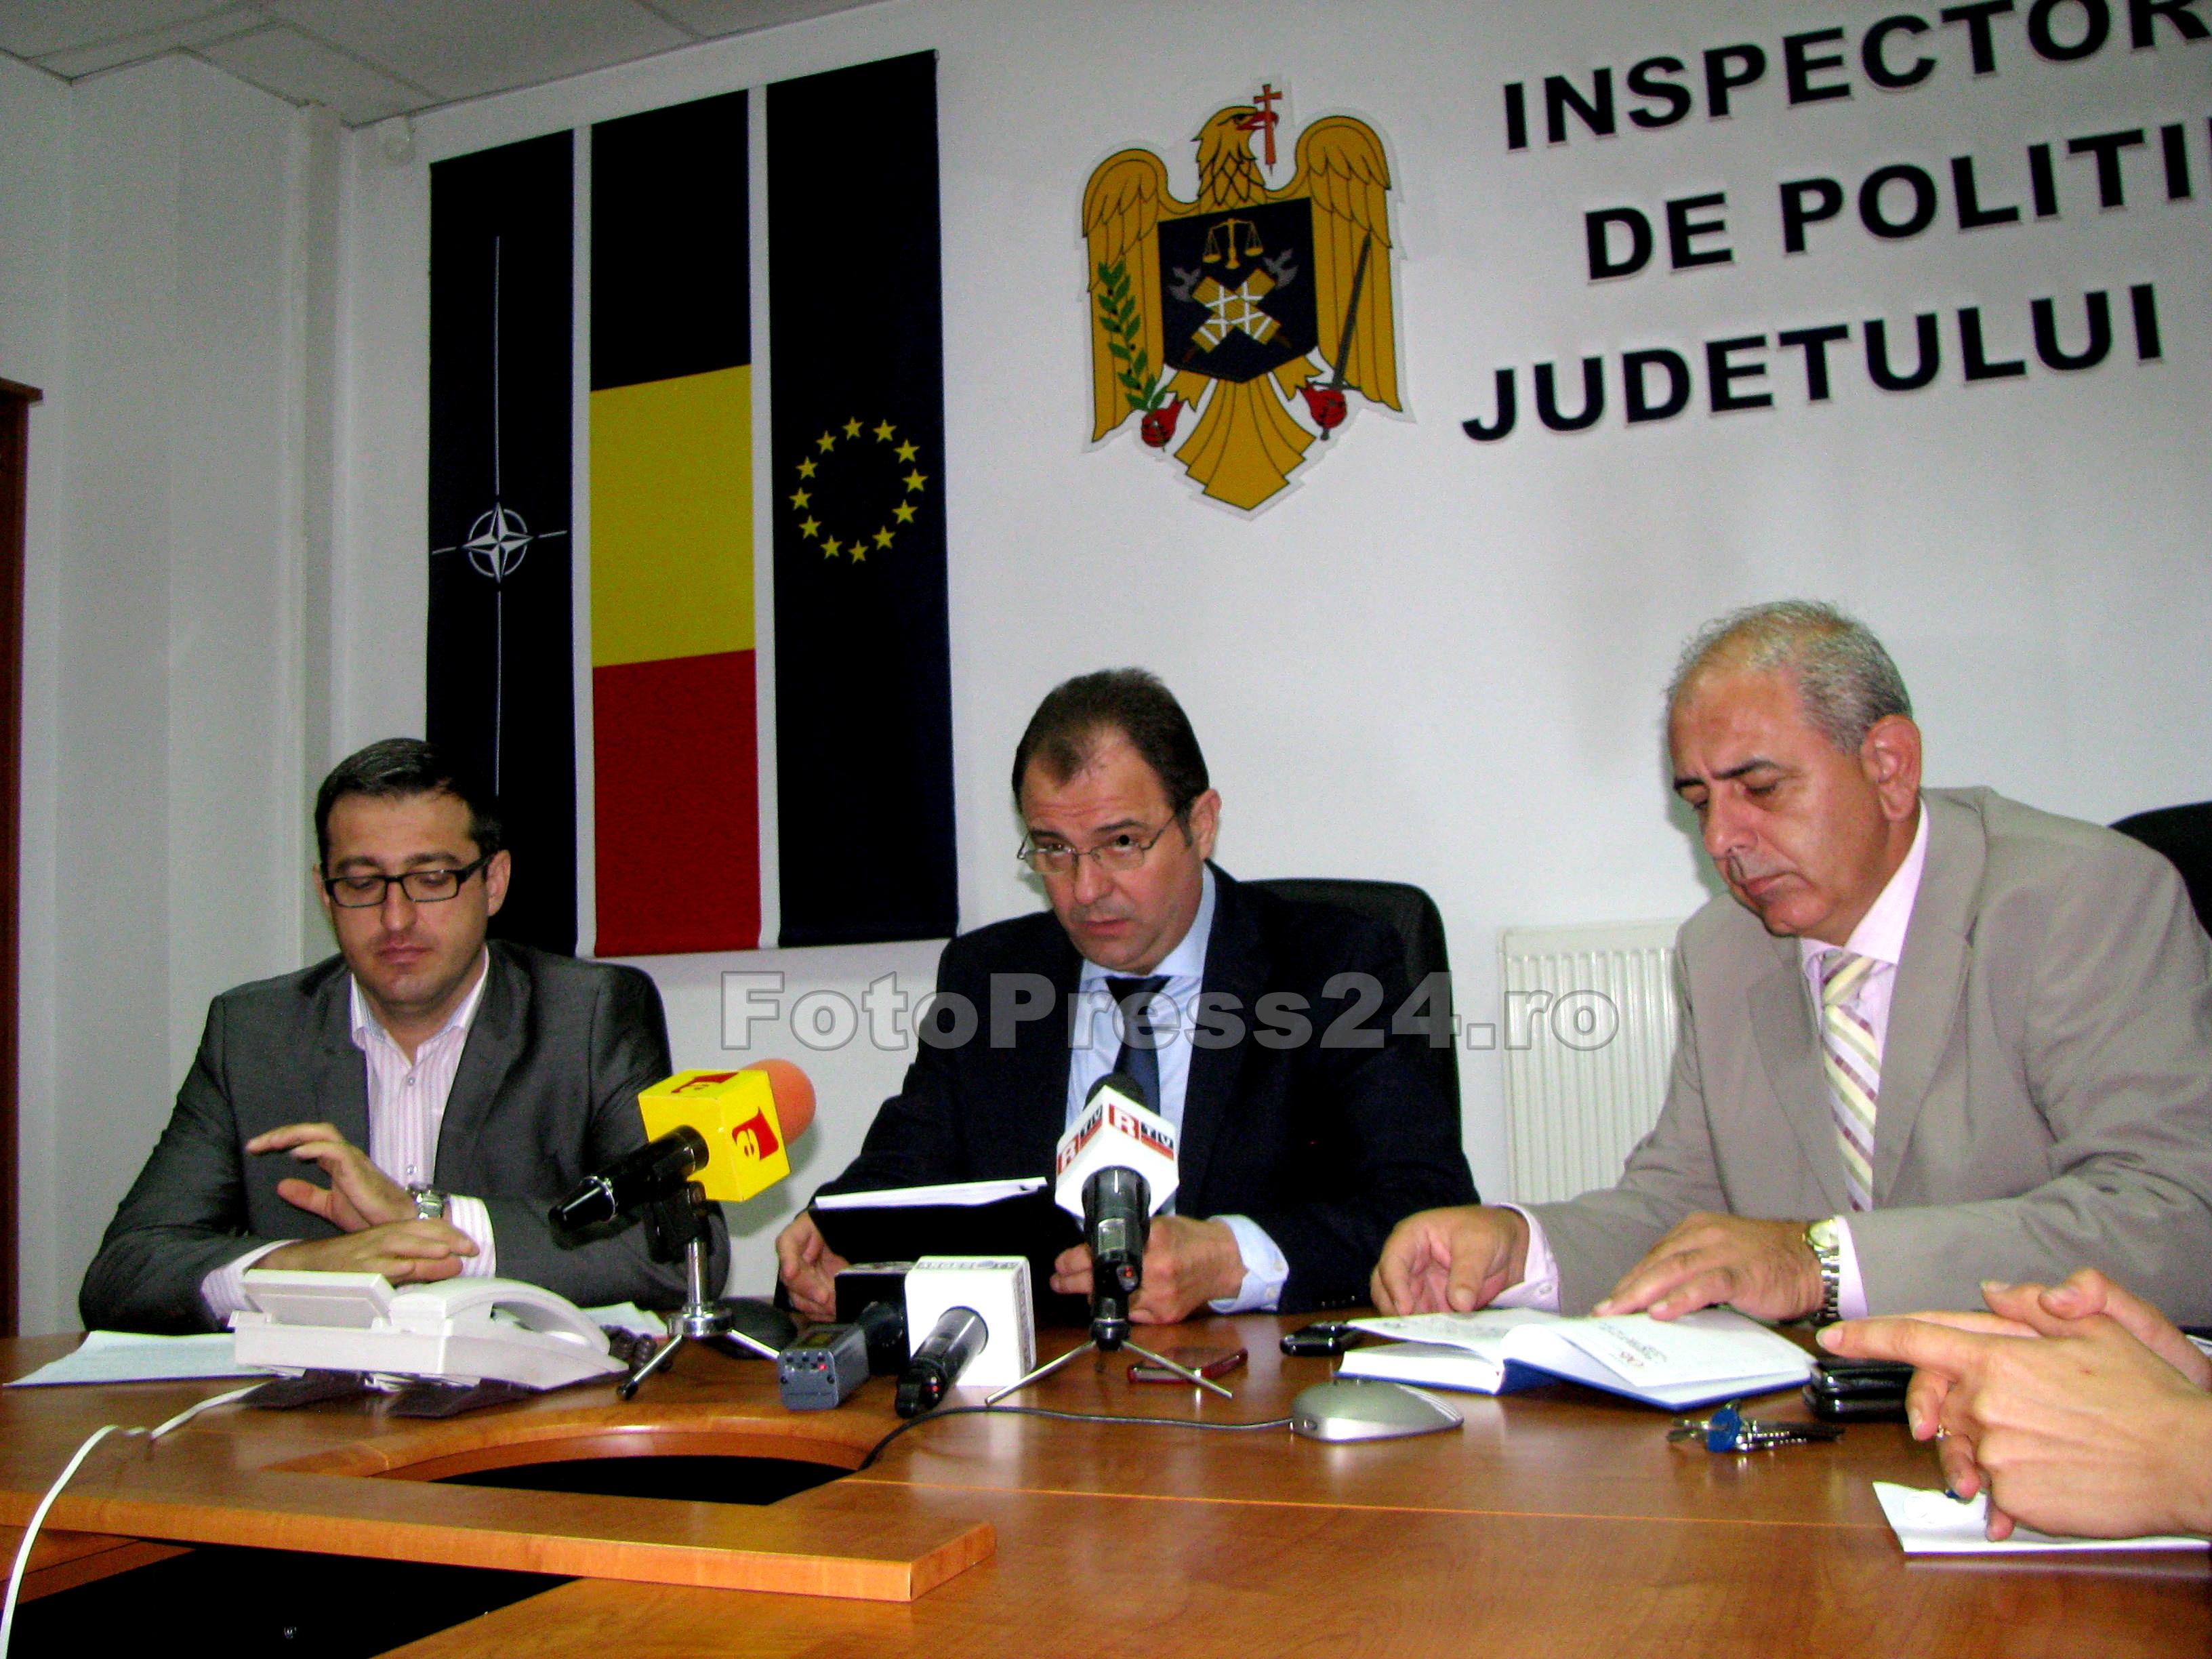 BilantPolitie-FotoPress24 (2)